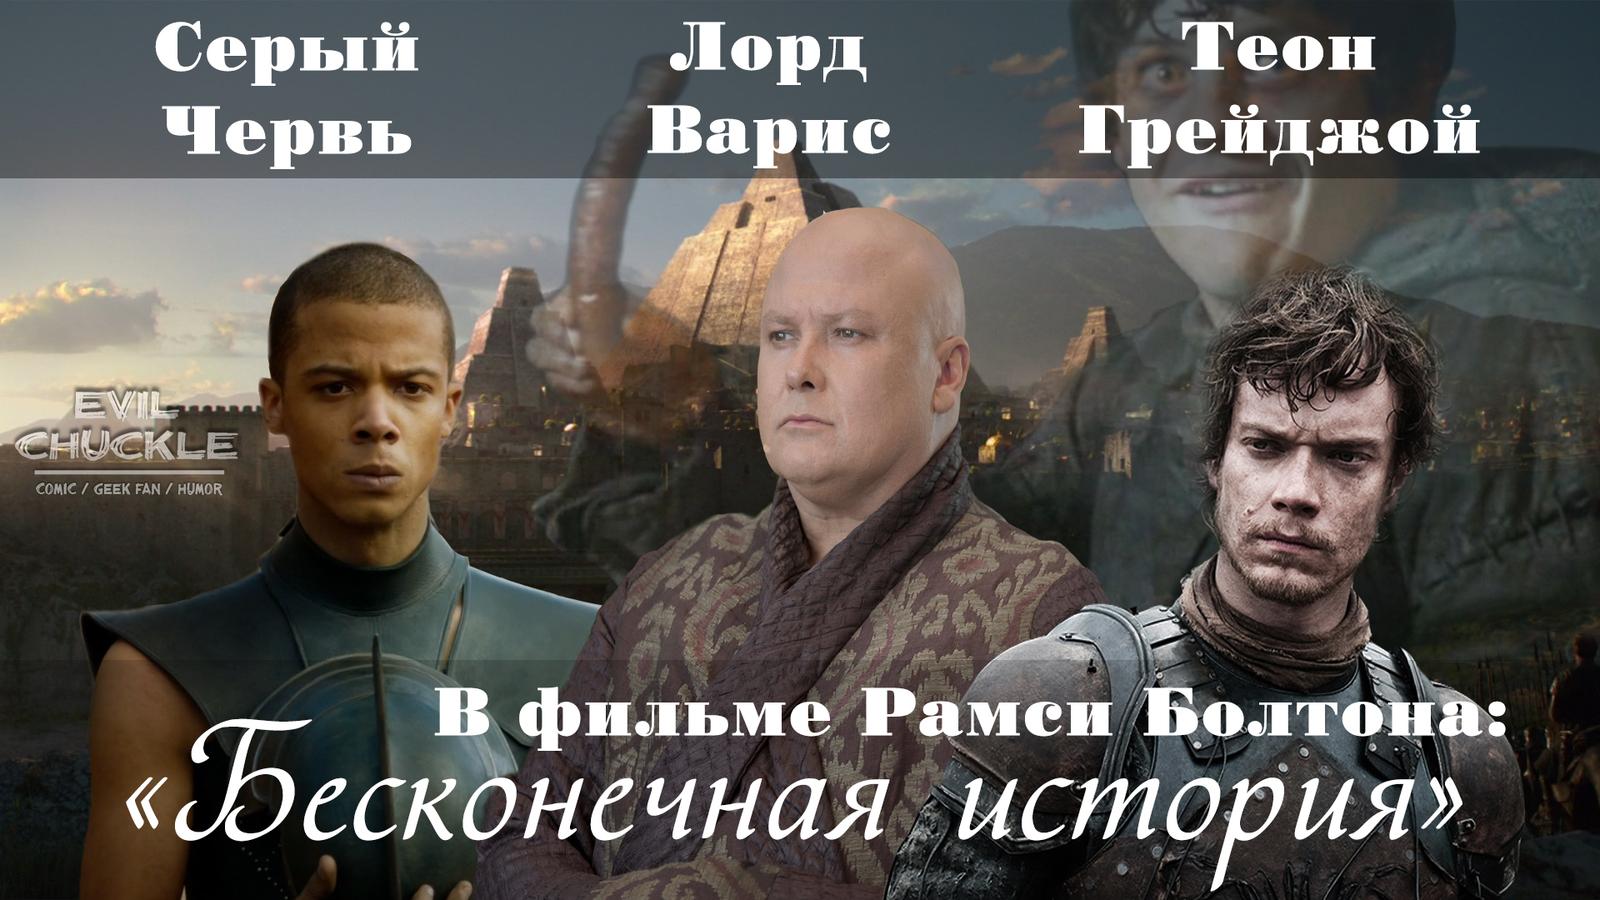 https://cs4.pikabu.ru/post_img/big/2016/06/08/7/1465387196117682586.jpg